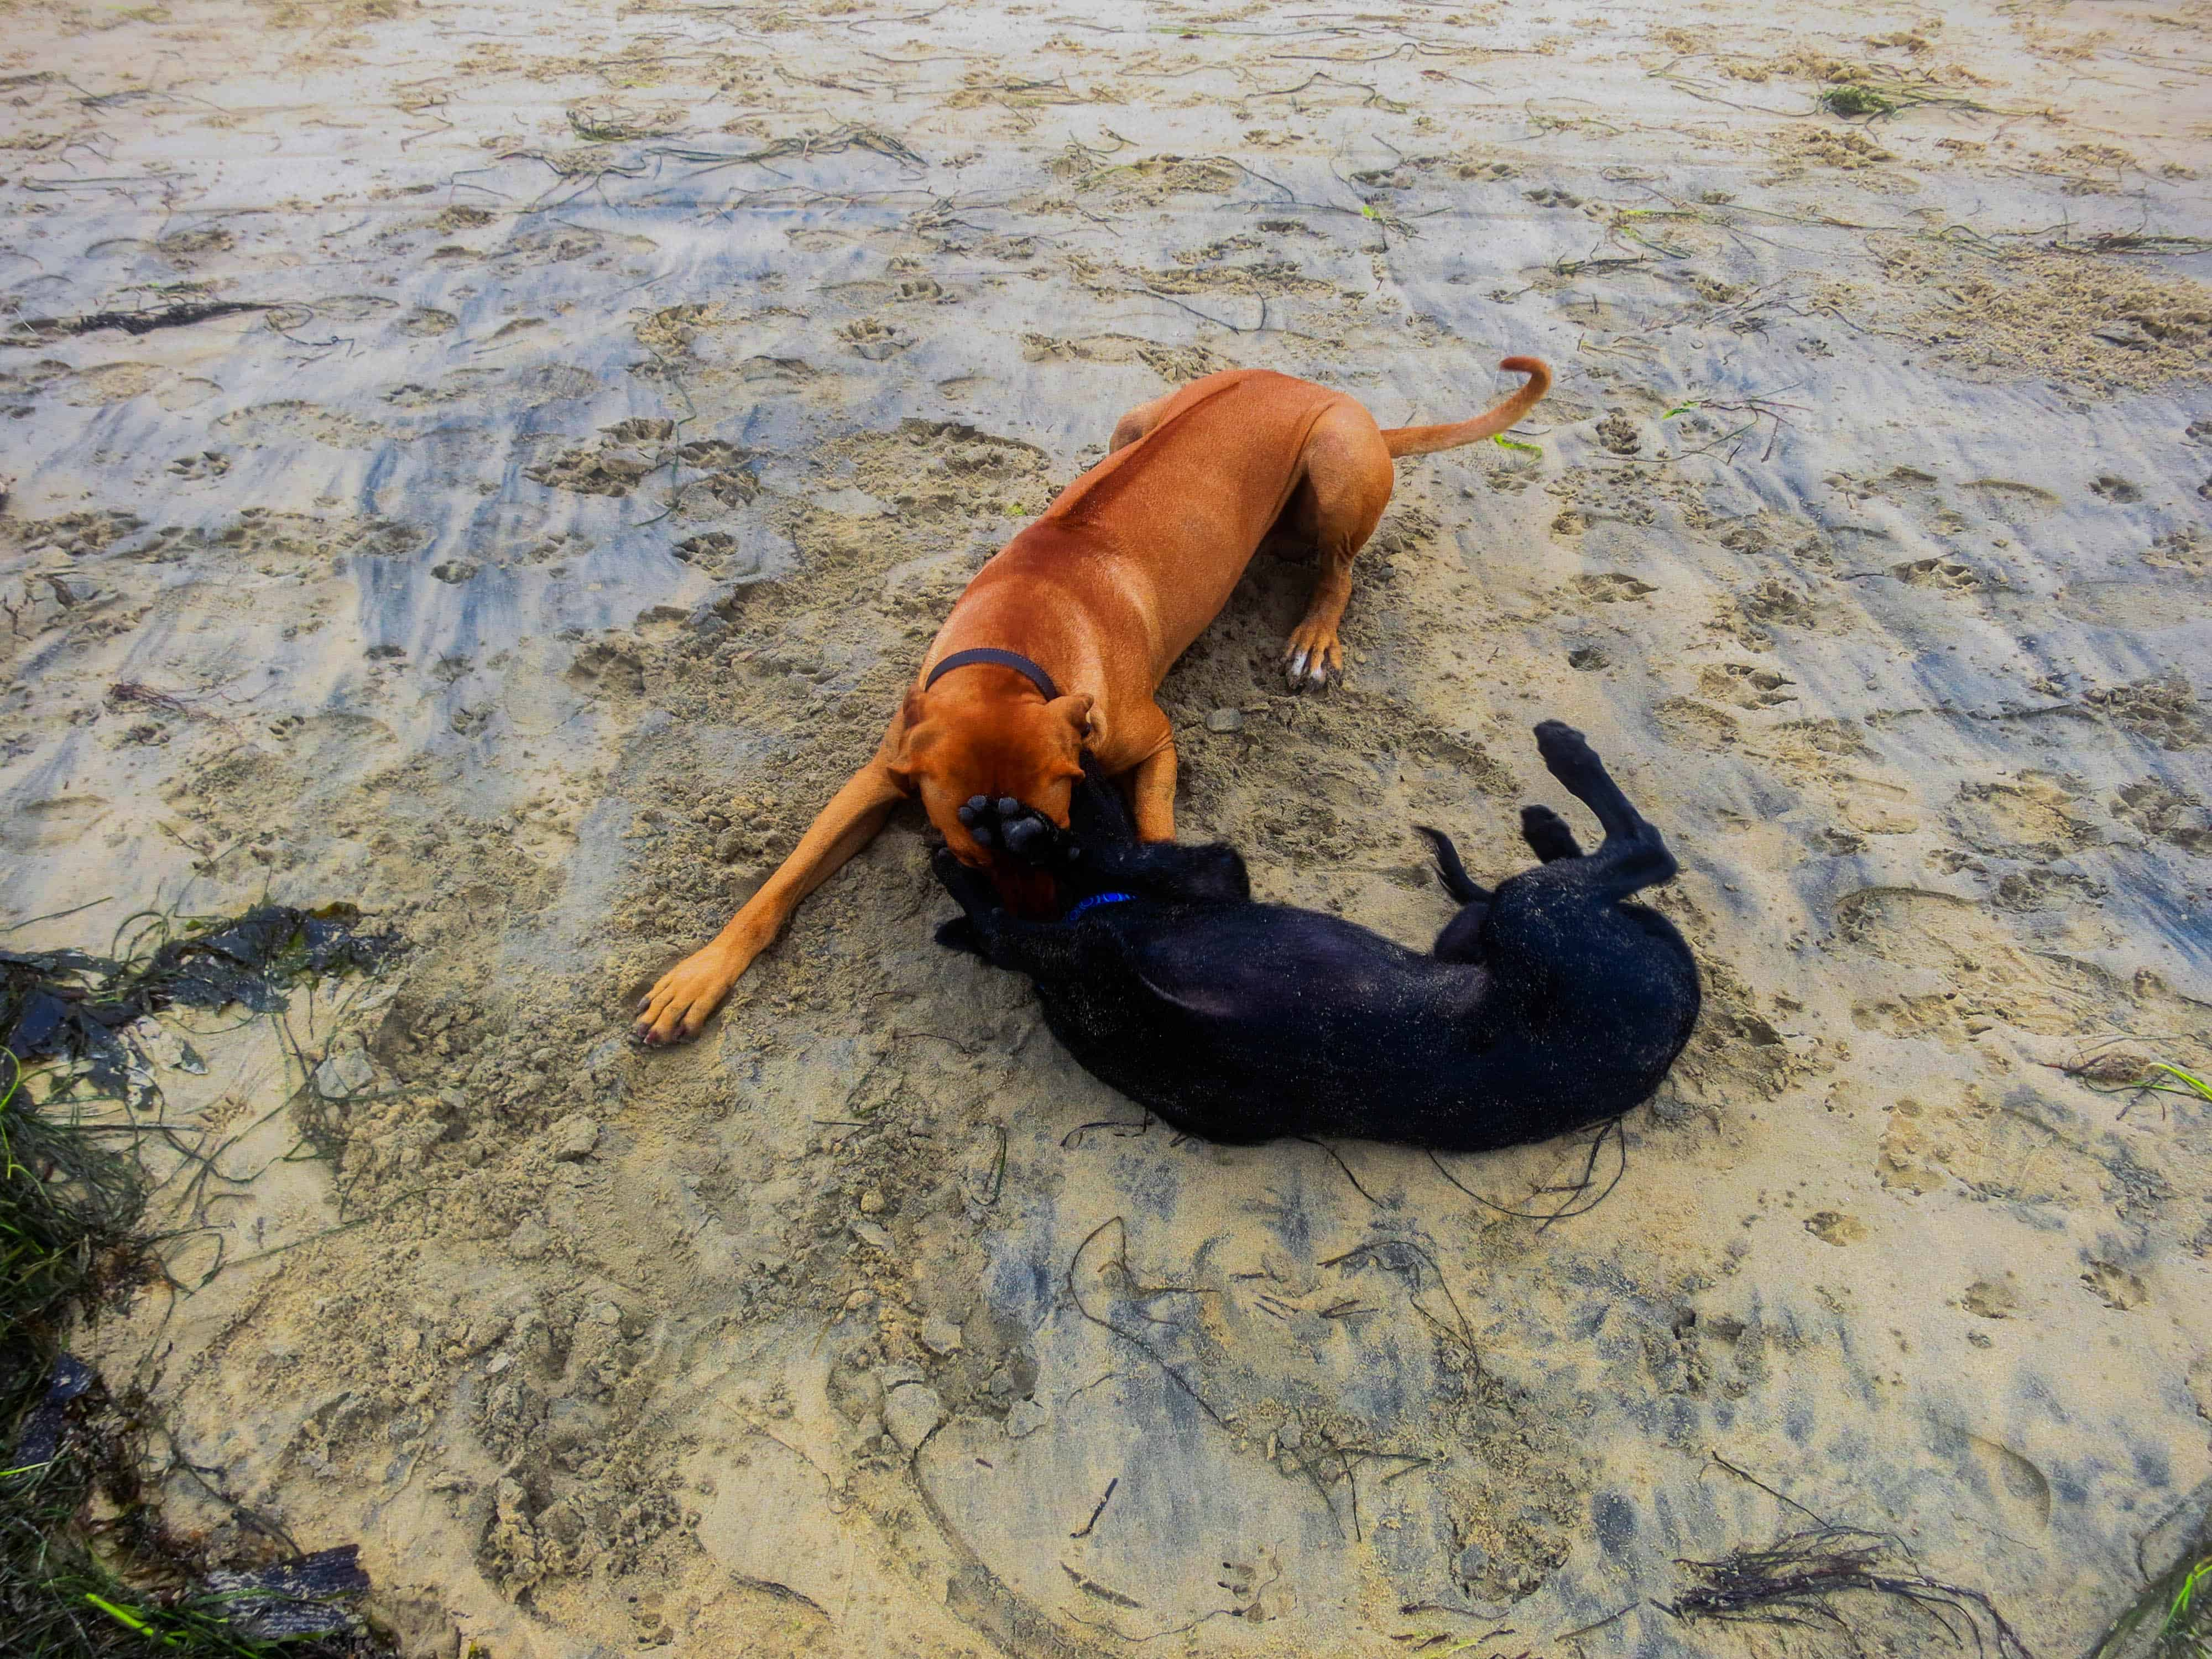 Teaching the puppy